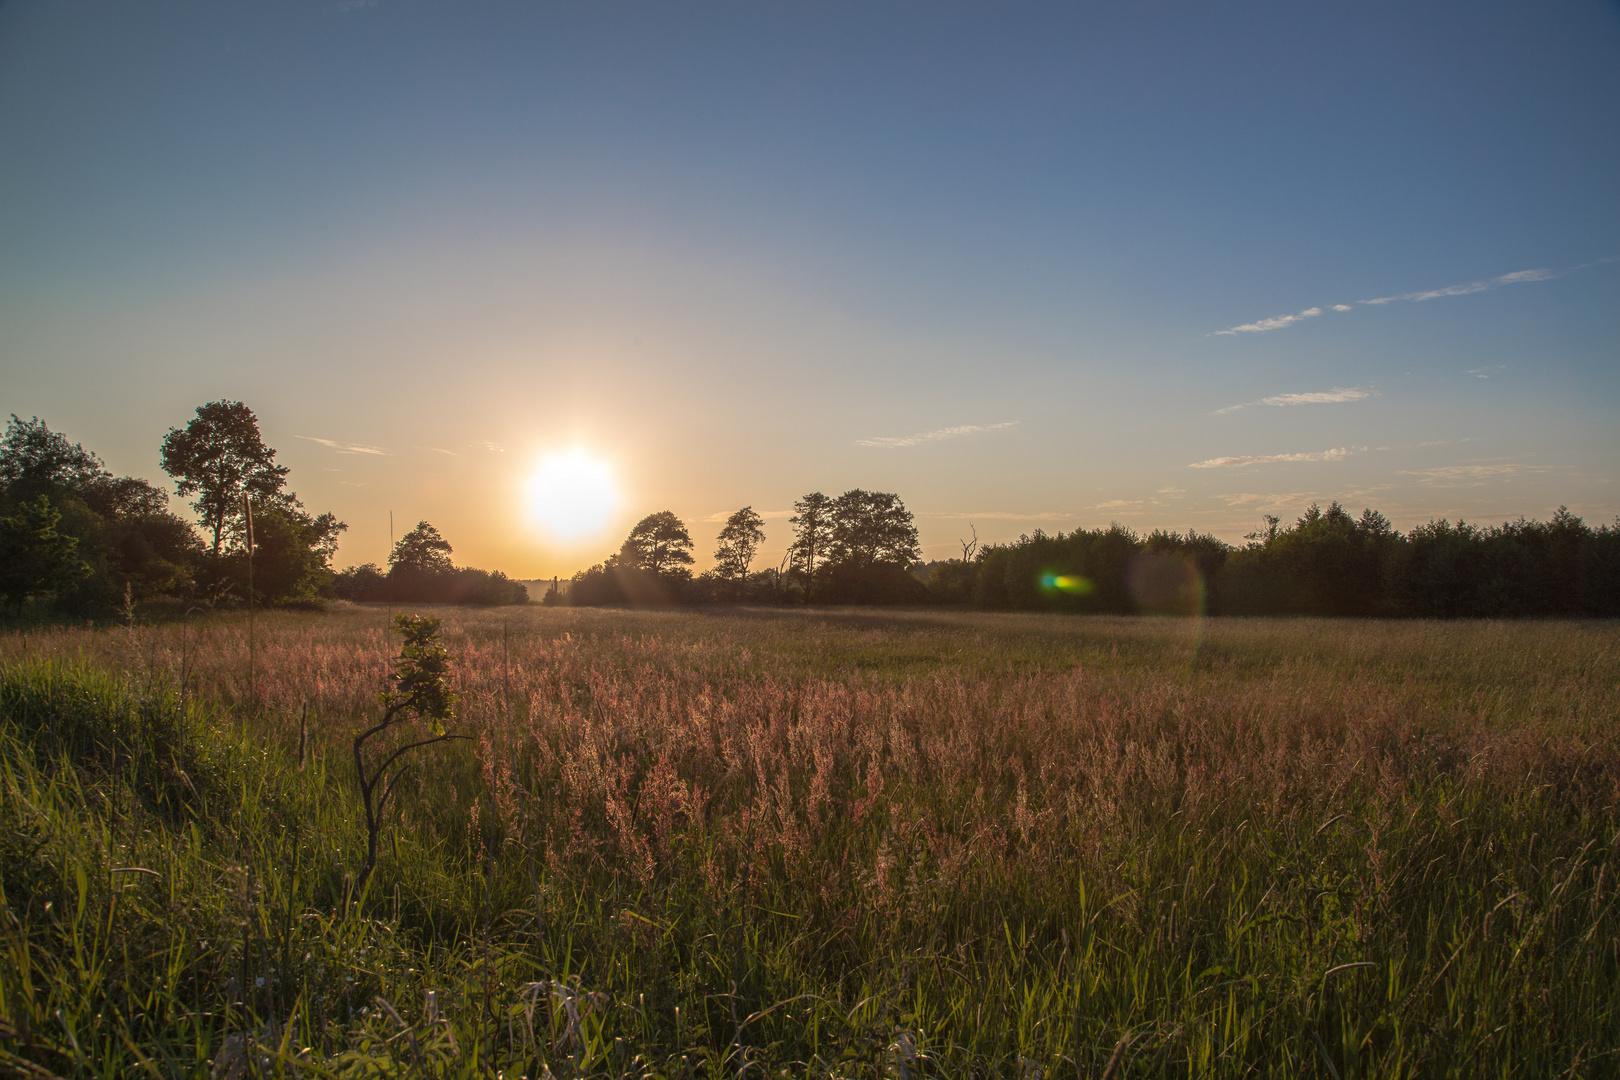 Sonnenuntergang nahe der Wümme